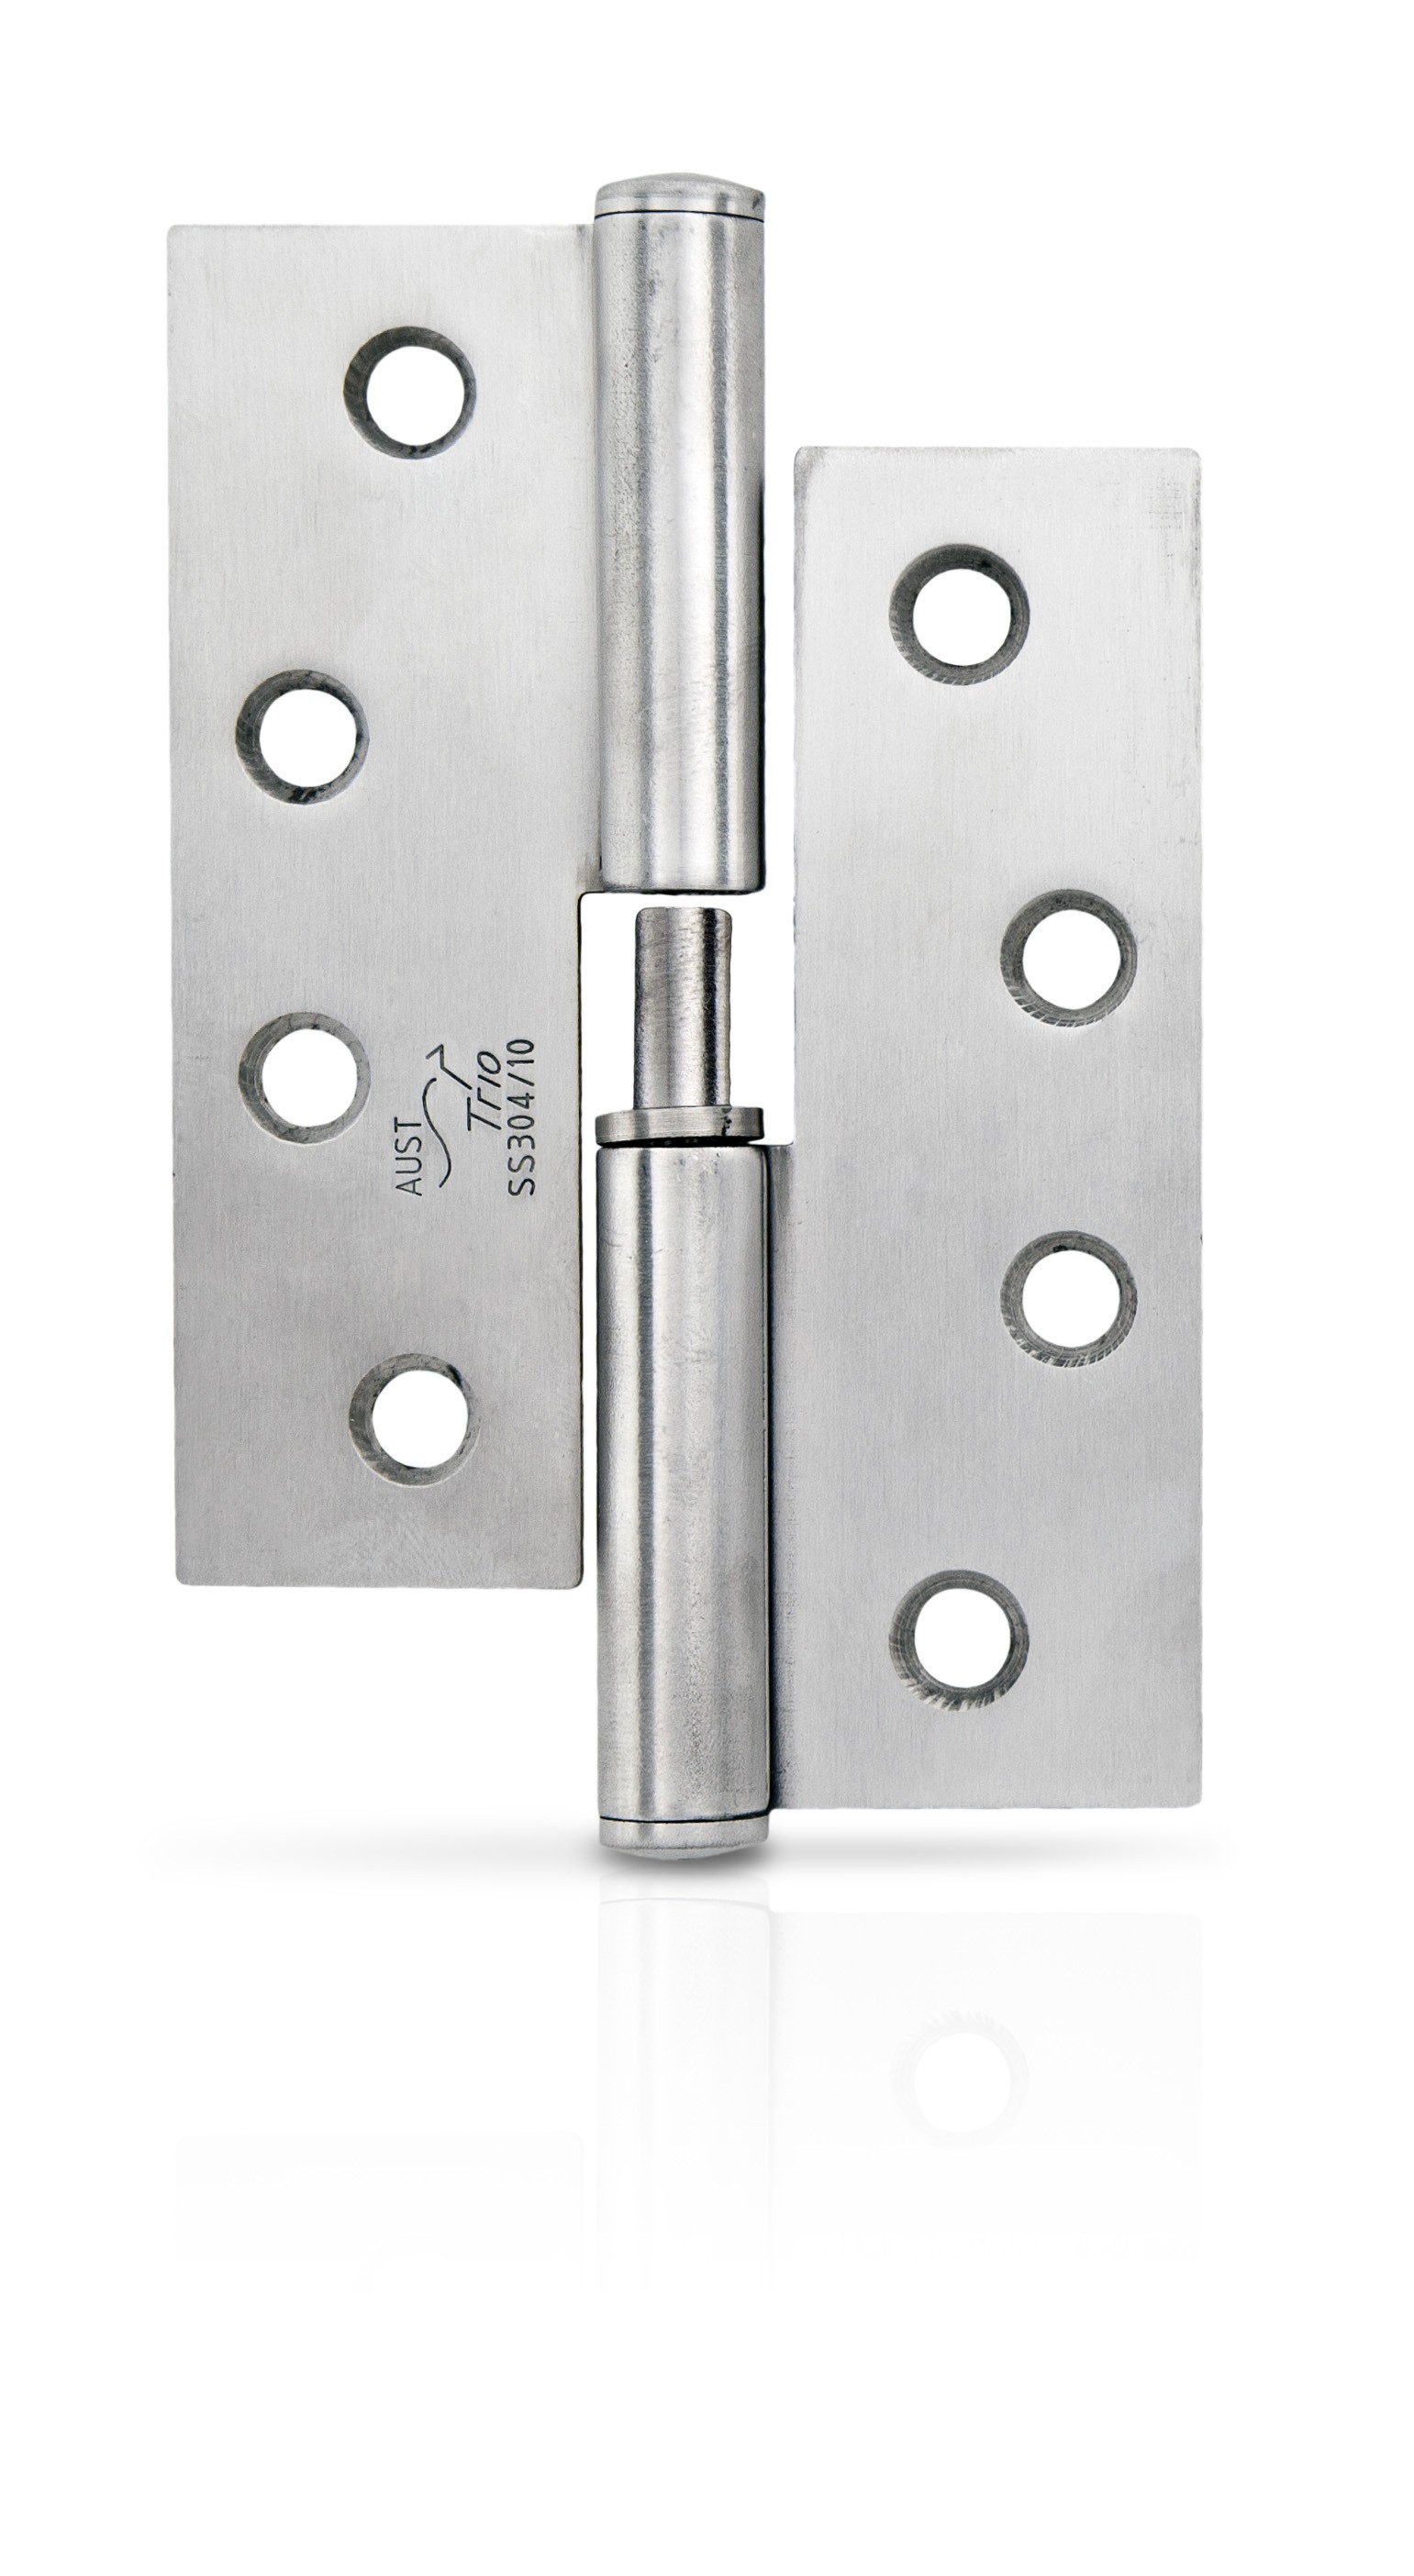 HINGE butt lift off stainless steel